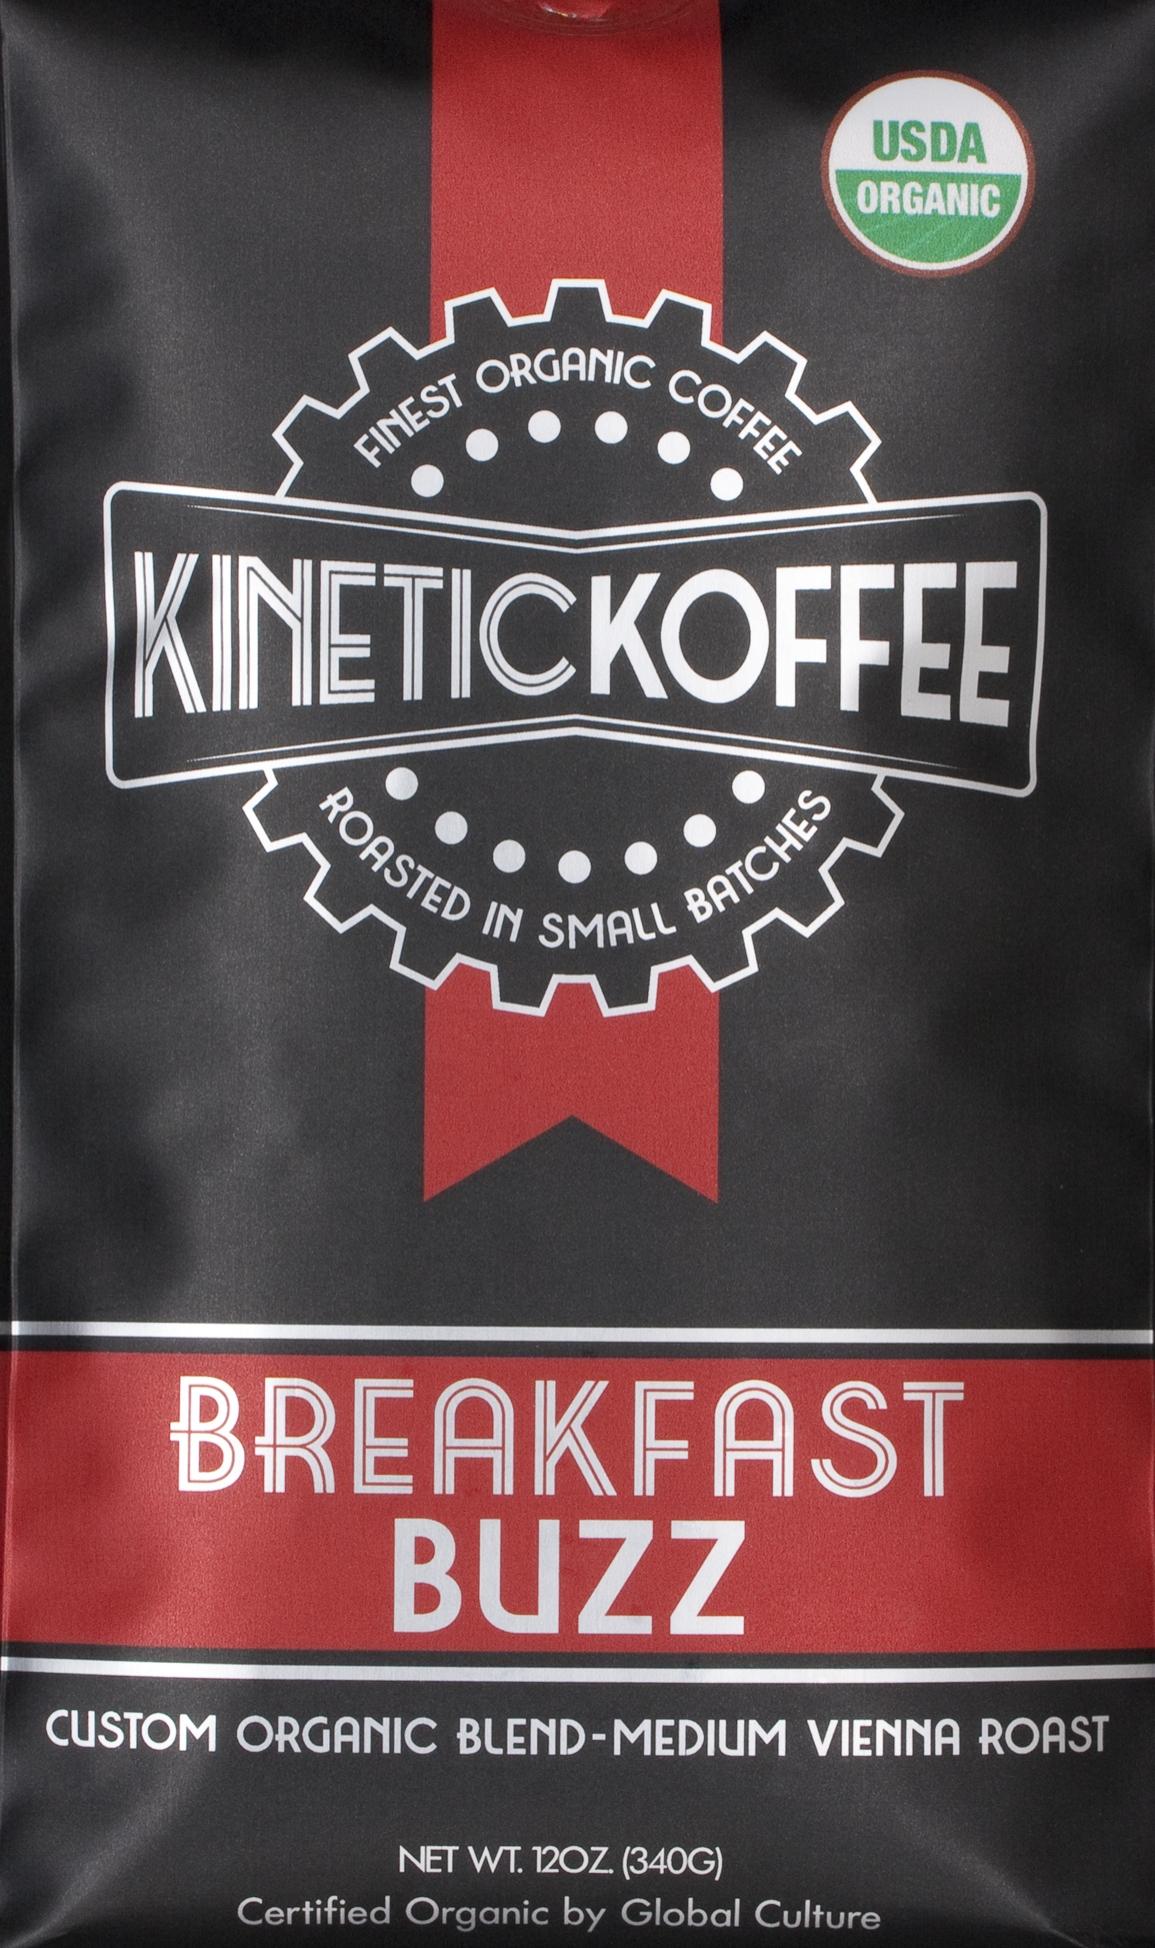 KK-Breakfast Buzz resize.jpg